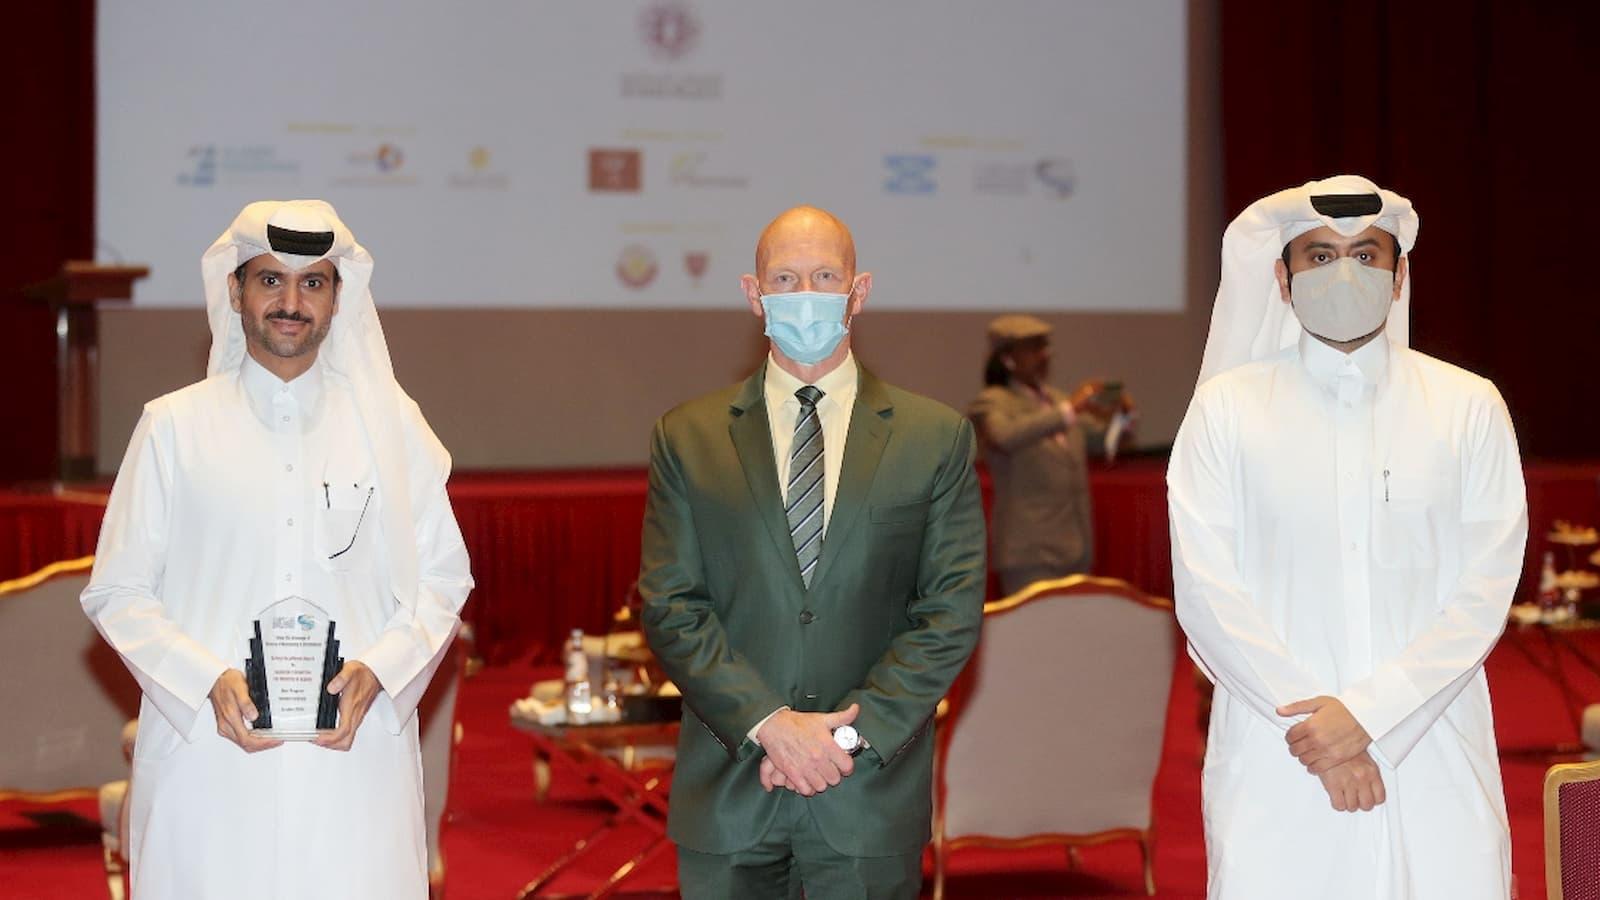 Qatar 2022 organizers get prestigious safety award for Workers' Welfare program